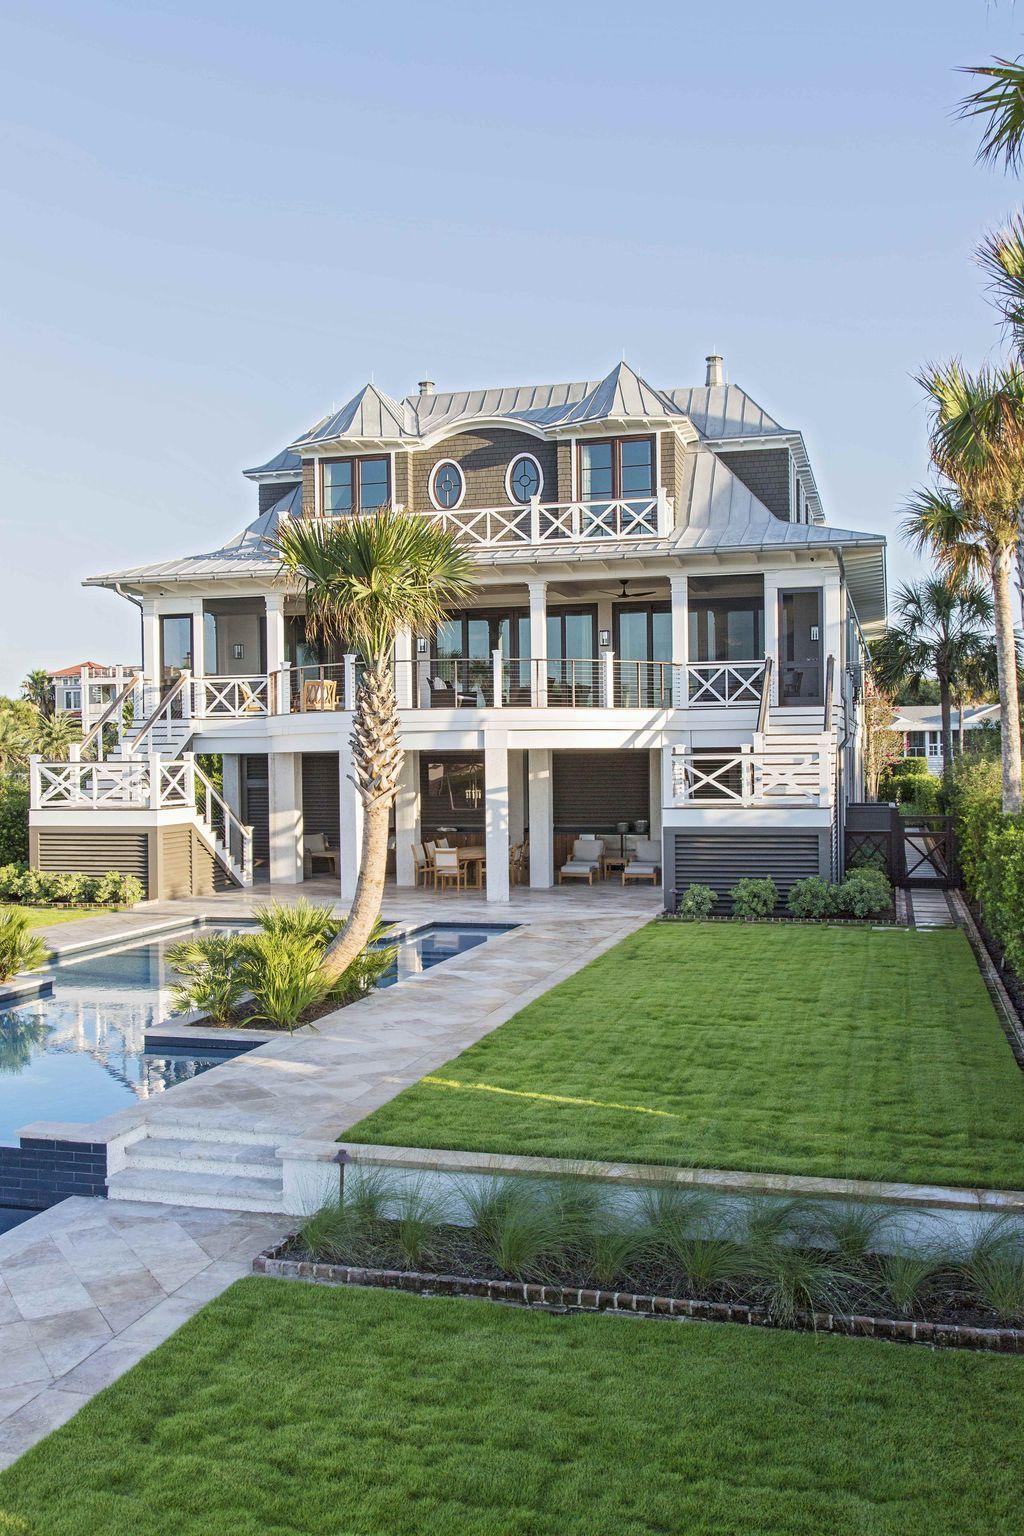 Isle Of Palms Oasis Herlong & Associates Architecture